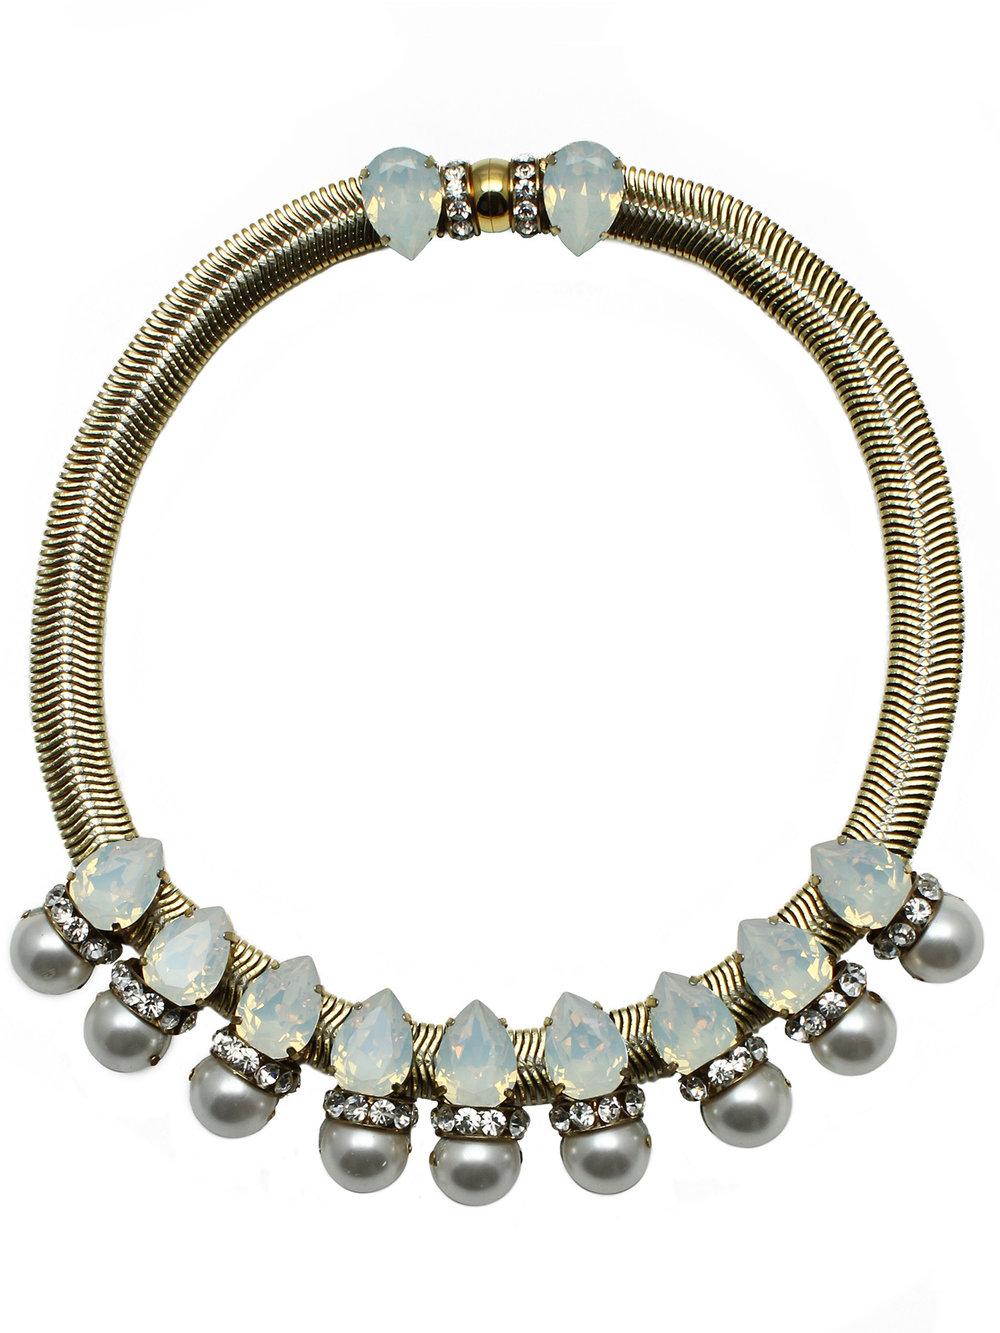 171N-WW Aragon Necklace - White.jpg